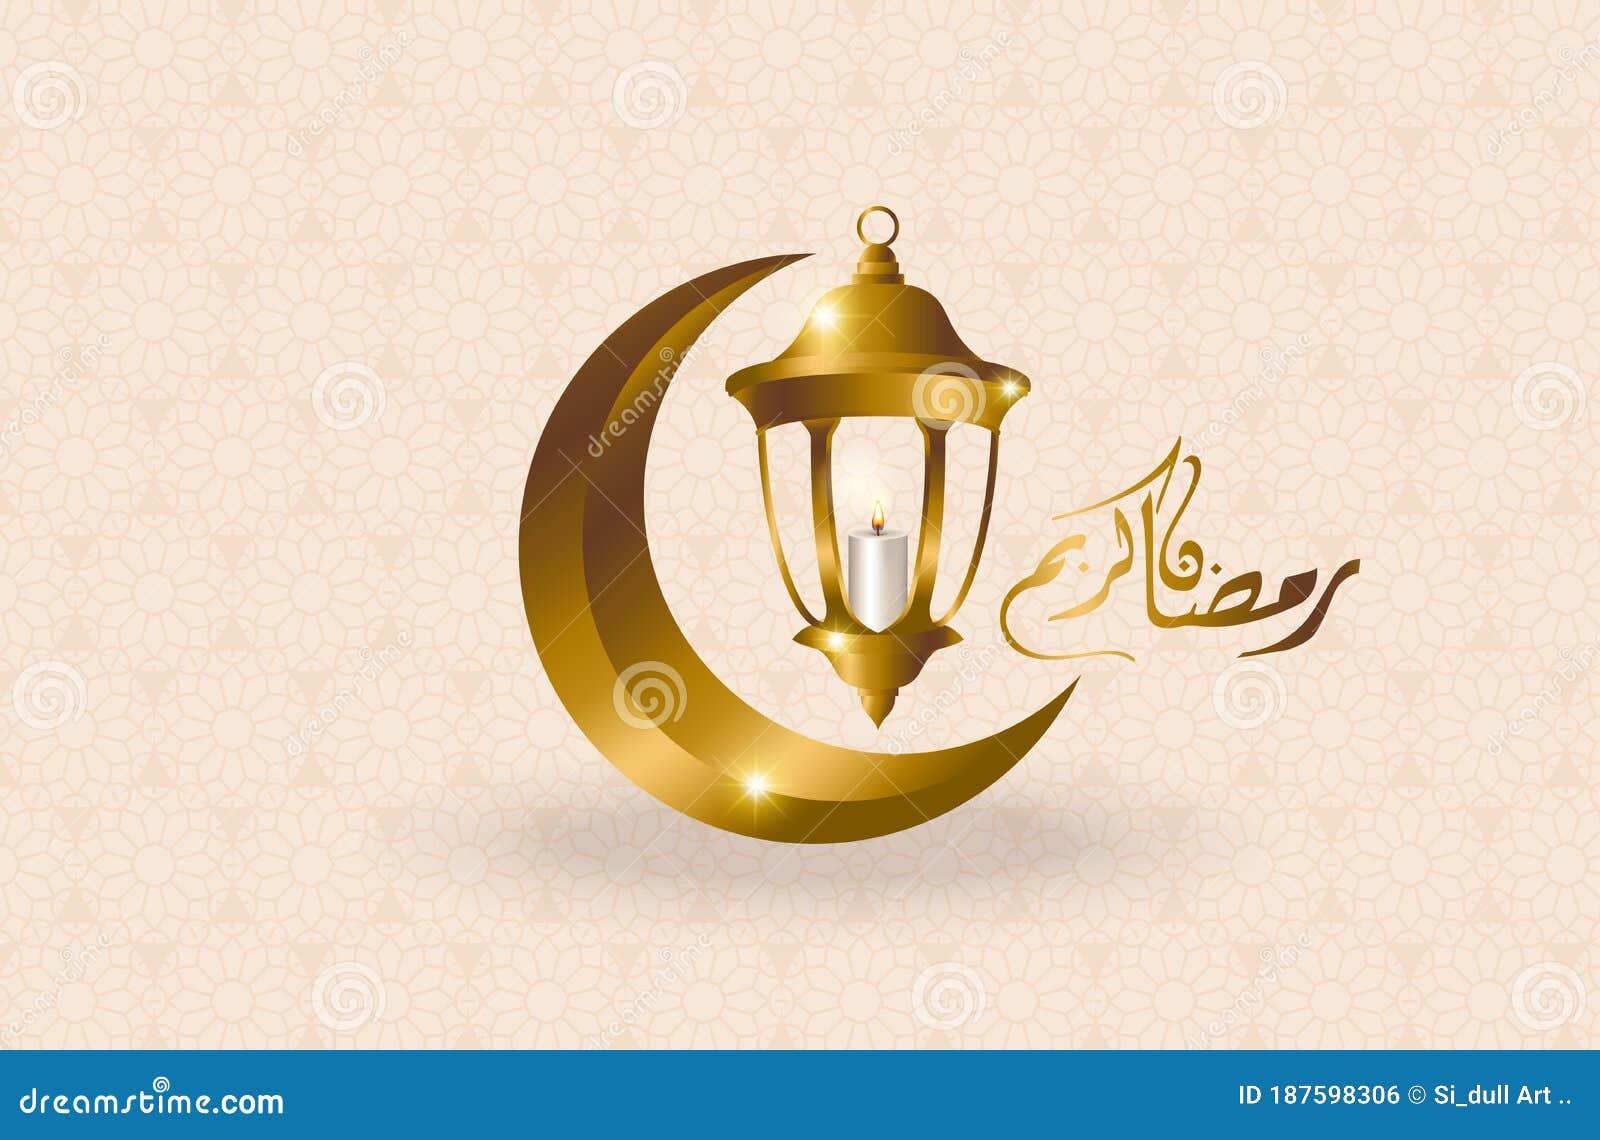 Ramadan Kareem Islamic Greeting Card Design Creative Concept Of Islamic Celebration Day Ramadan Kareem Or Eid Al Fitr Adha Hajj Stock Vector Illustration Of Greeting Concept 187598306